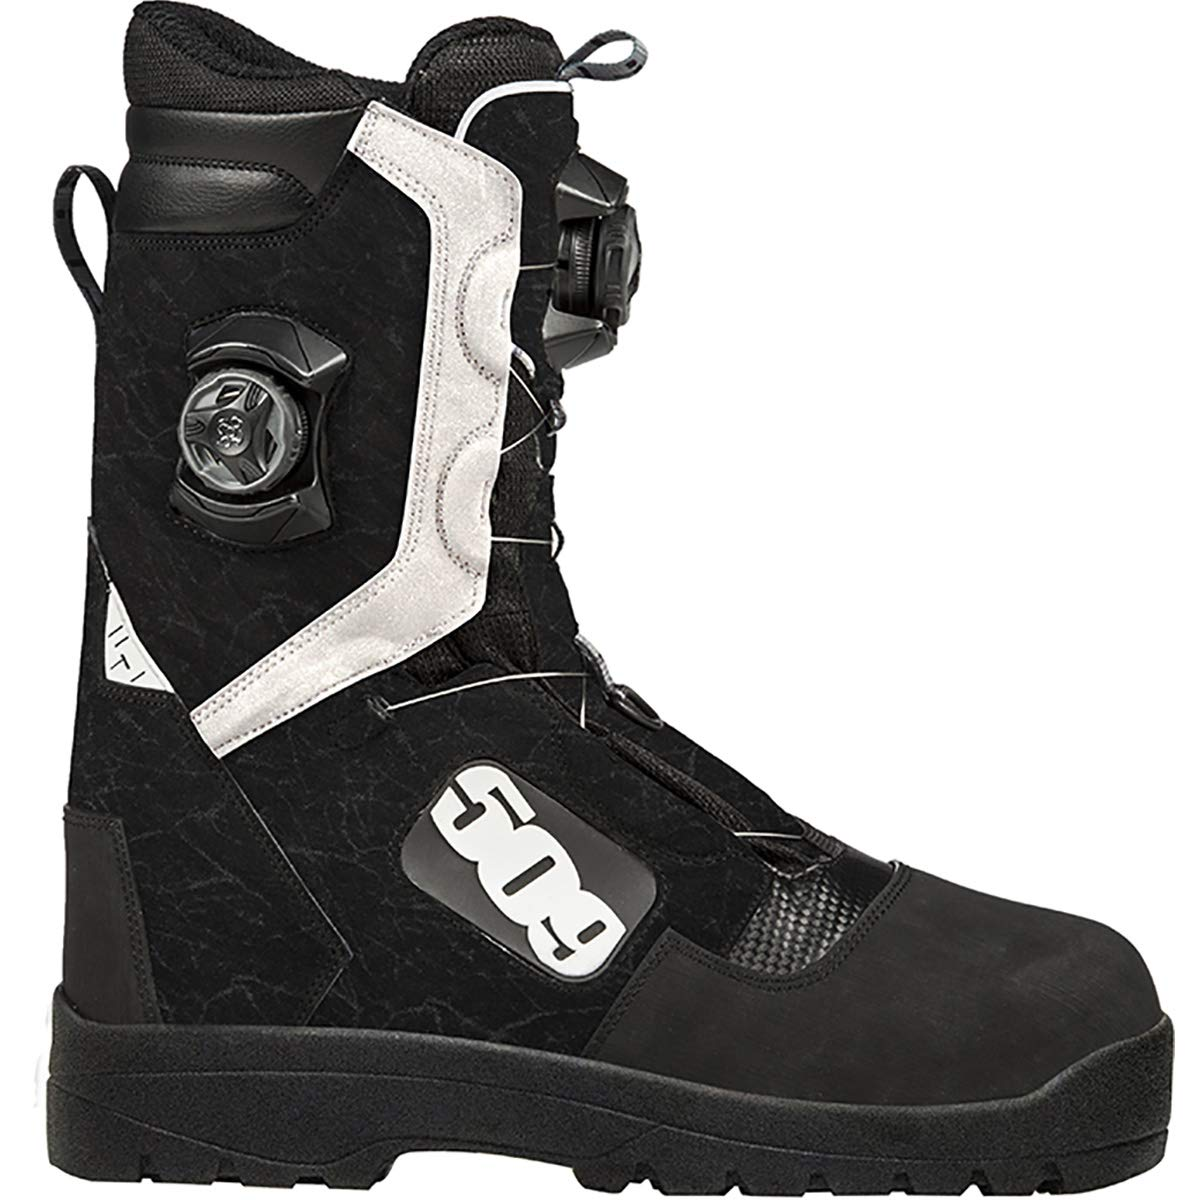 Black Ops - 11 509 Raid Boa Boot